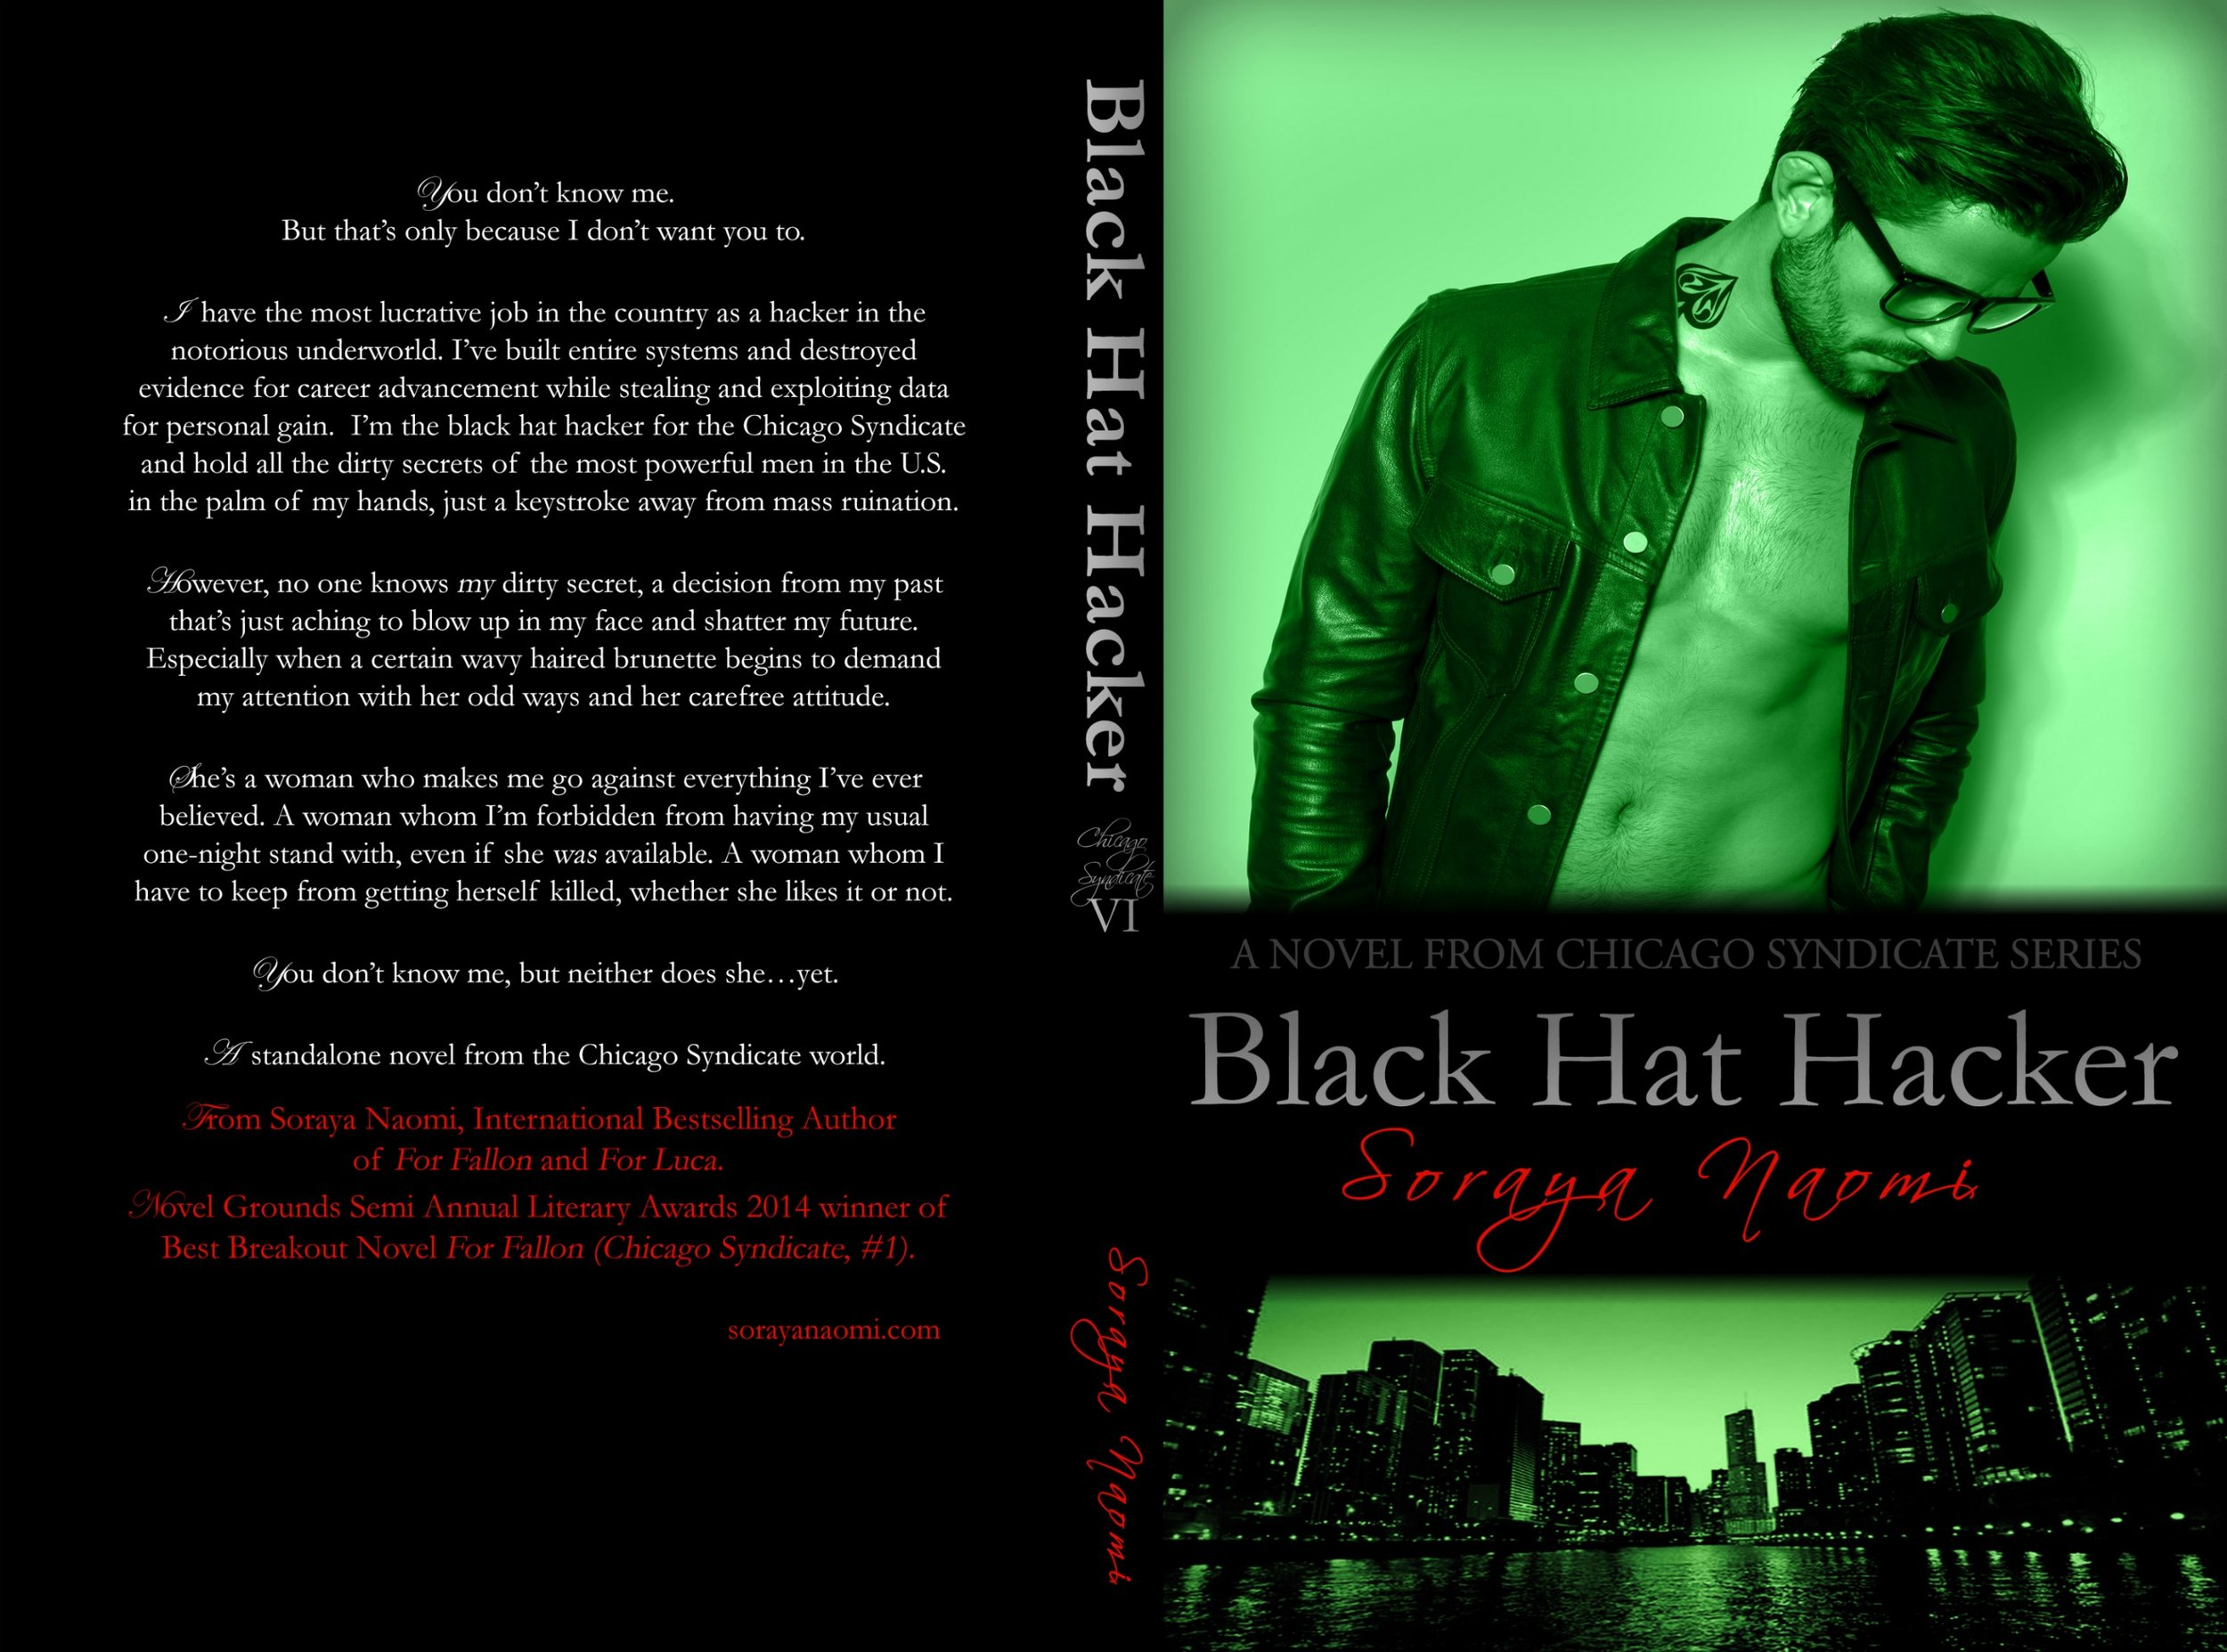 Black Hat Hacker Full Wrap.jpg